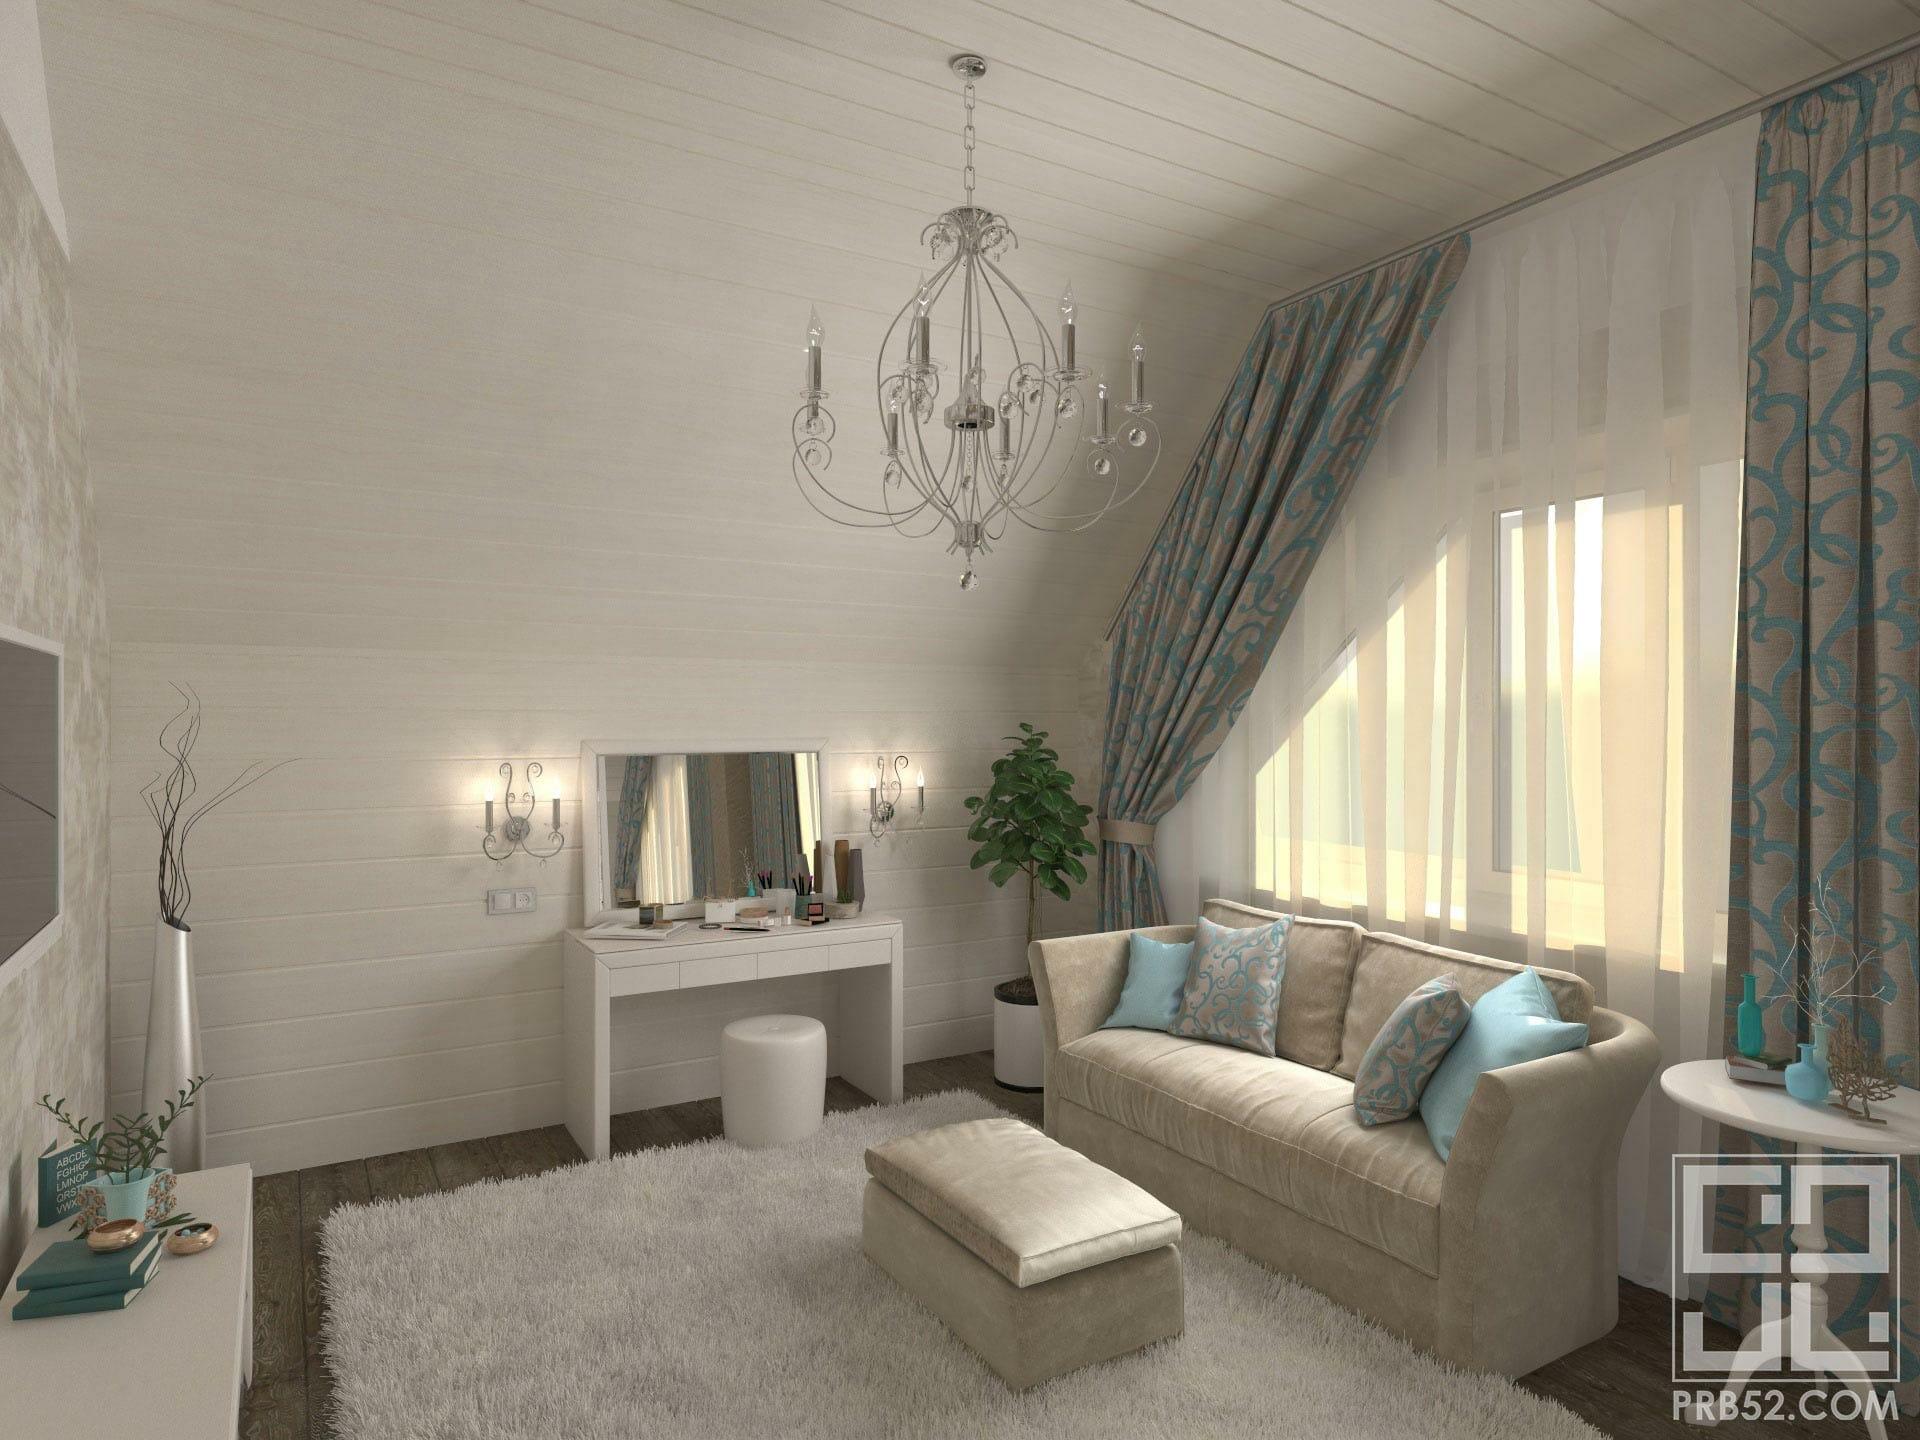 дизайн интерьера спальня женский уголок